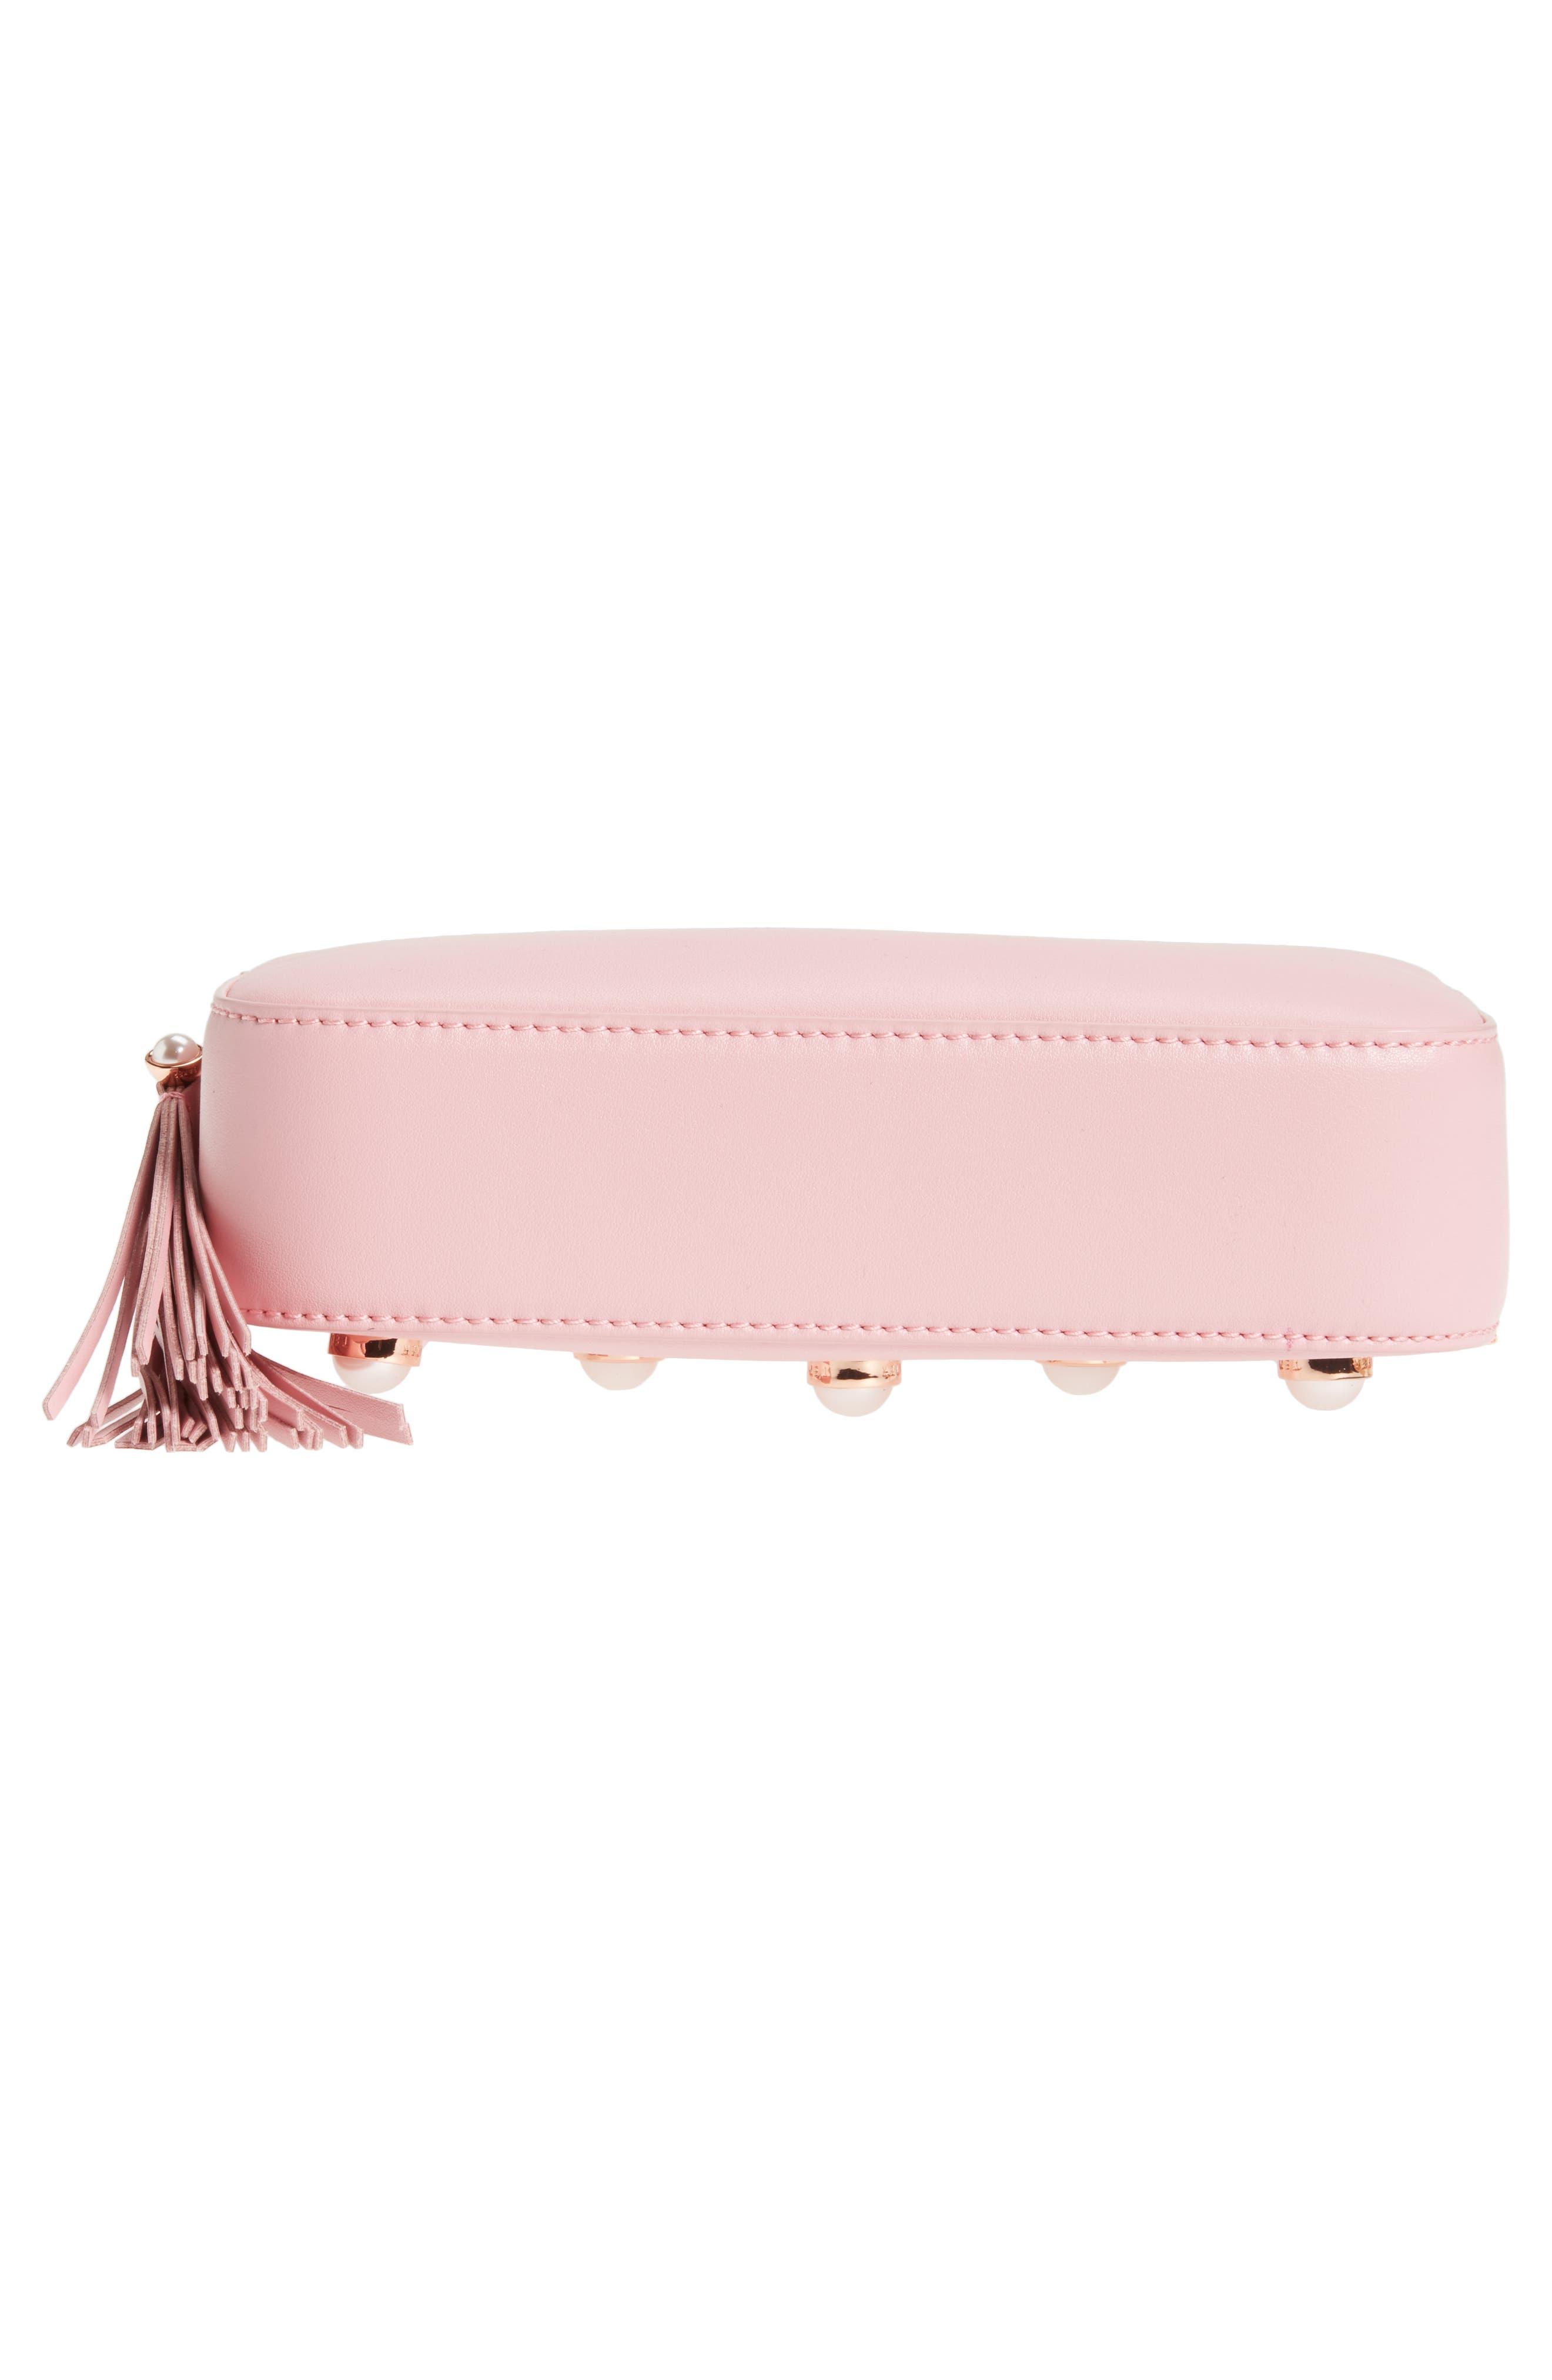 Alessia Imitation Pearl Embellished Leather Crossbody,                             Alternate thumbnail 6, color,                             Dusky Pink